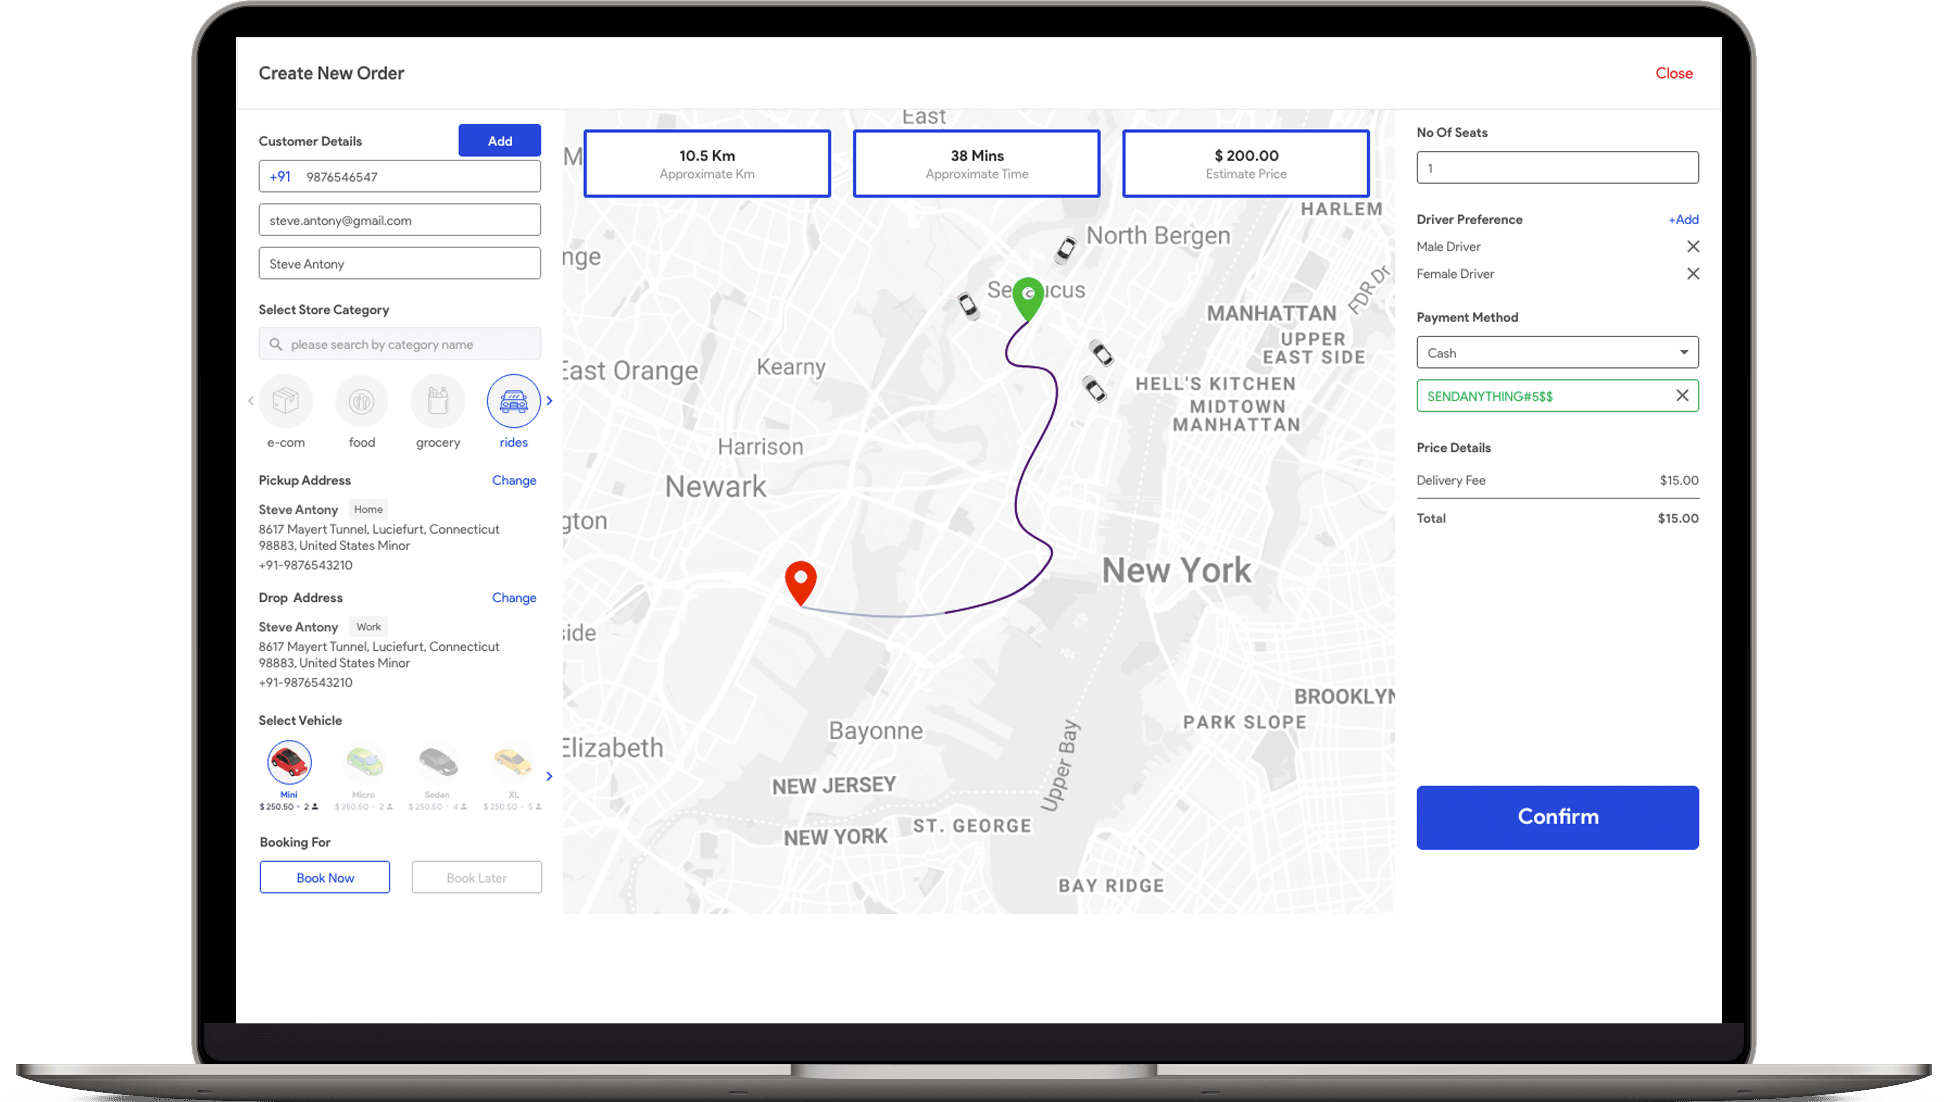 uber clone script Uber CLone Script - Uber Clone White Label Online Taxi Dispatch Software